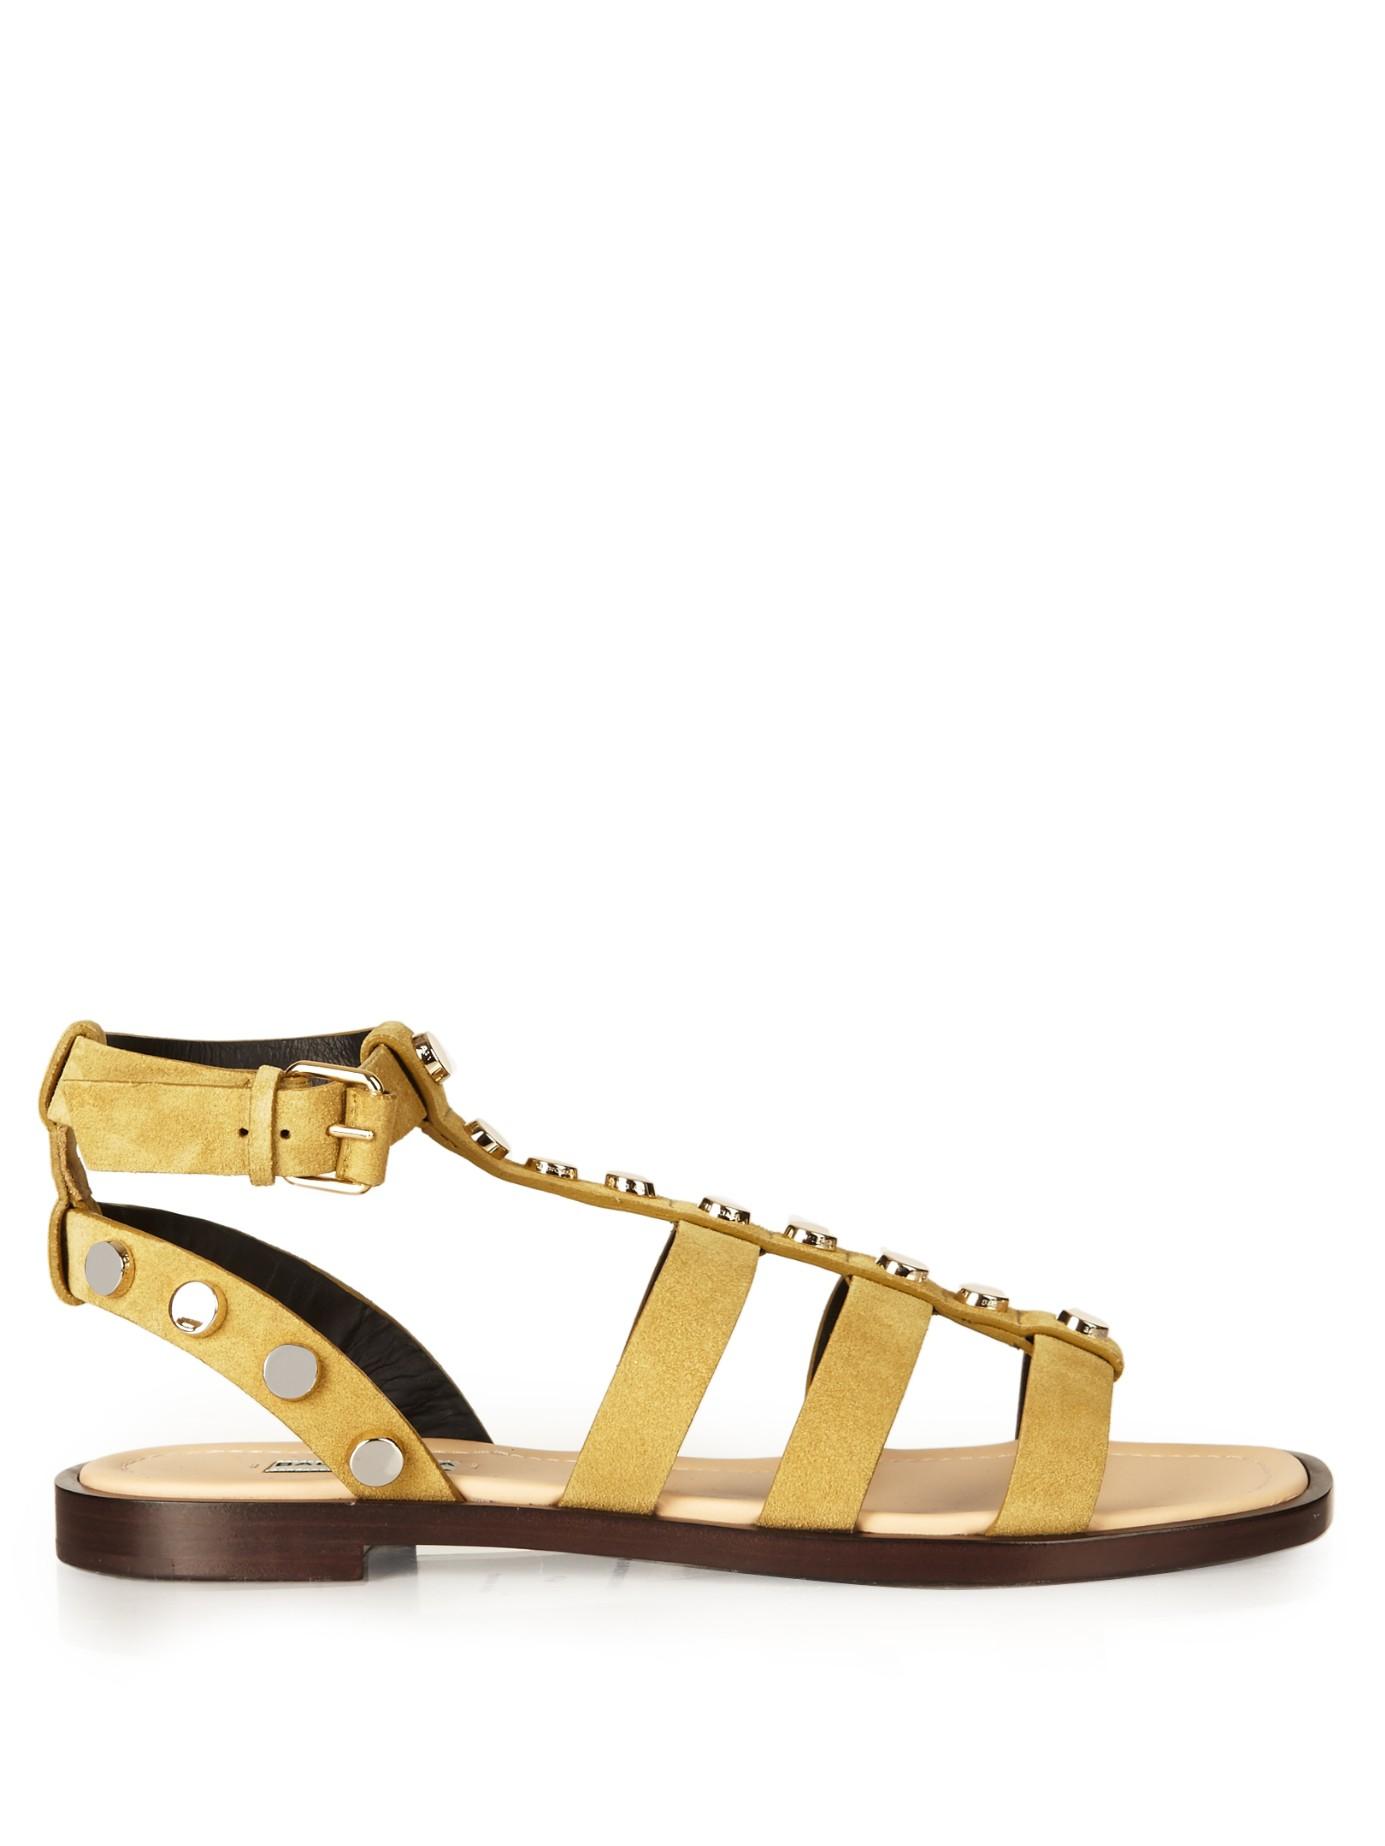 44497842eca Balenciaga Amp Stud-embellished Suede Gladiator Sandals in Yellow - Lyst